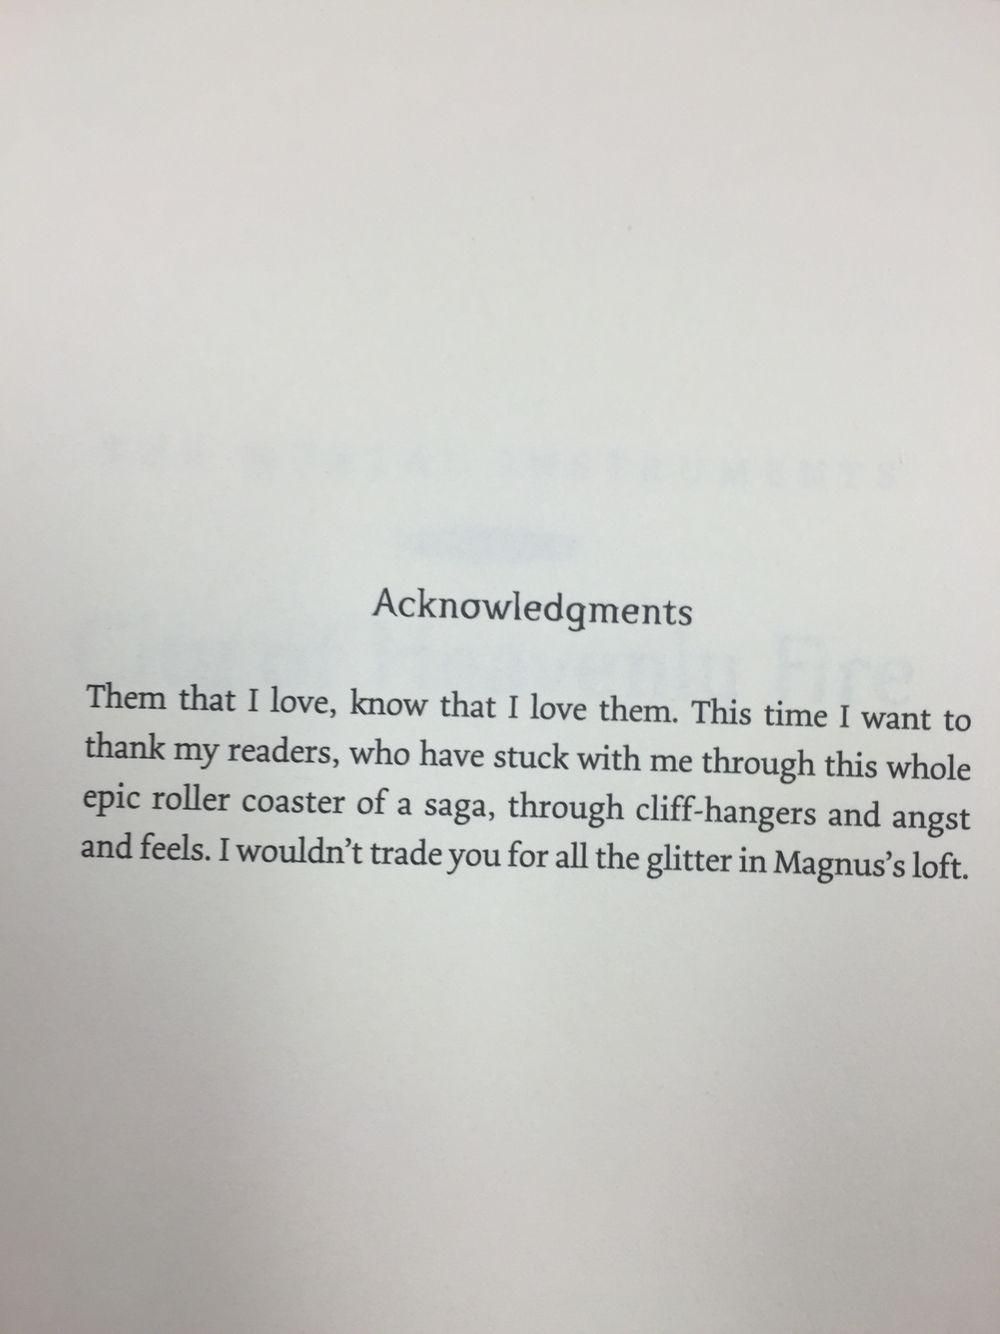 11 Book acknowledgements ideas  book dedication, book quotes